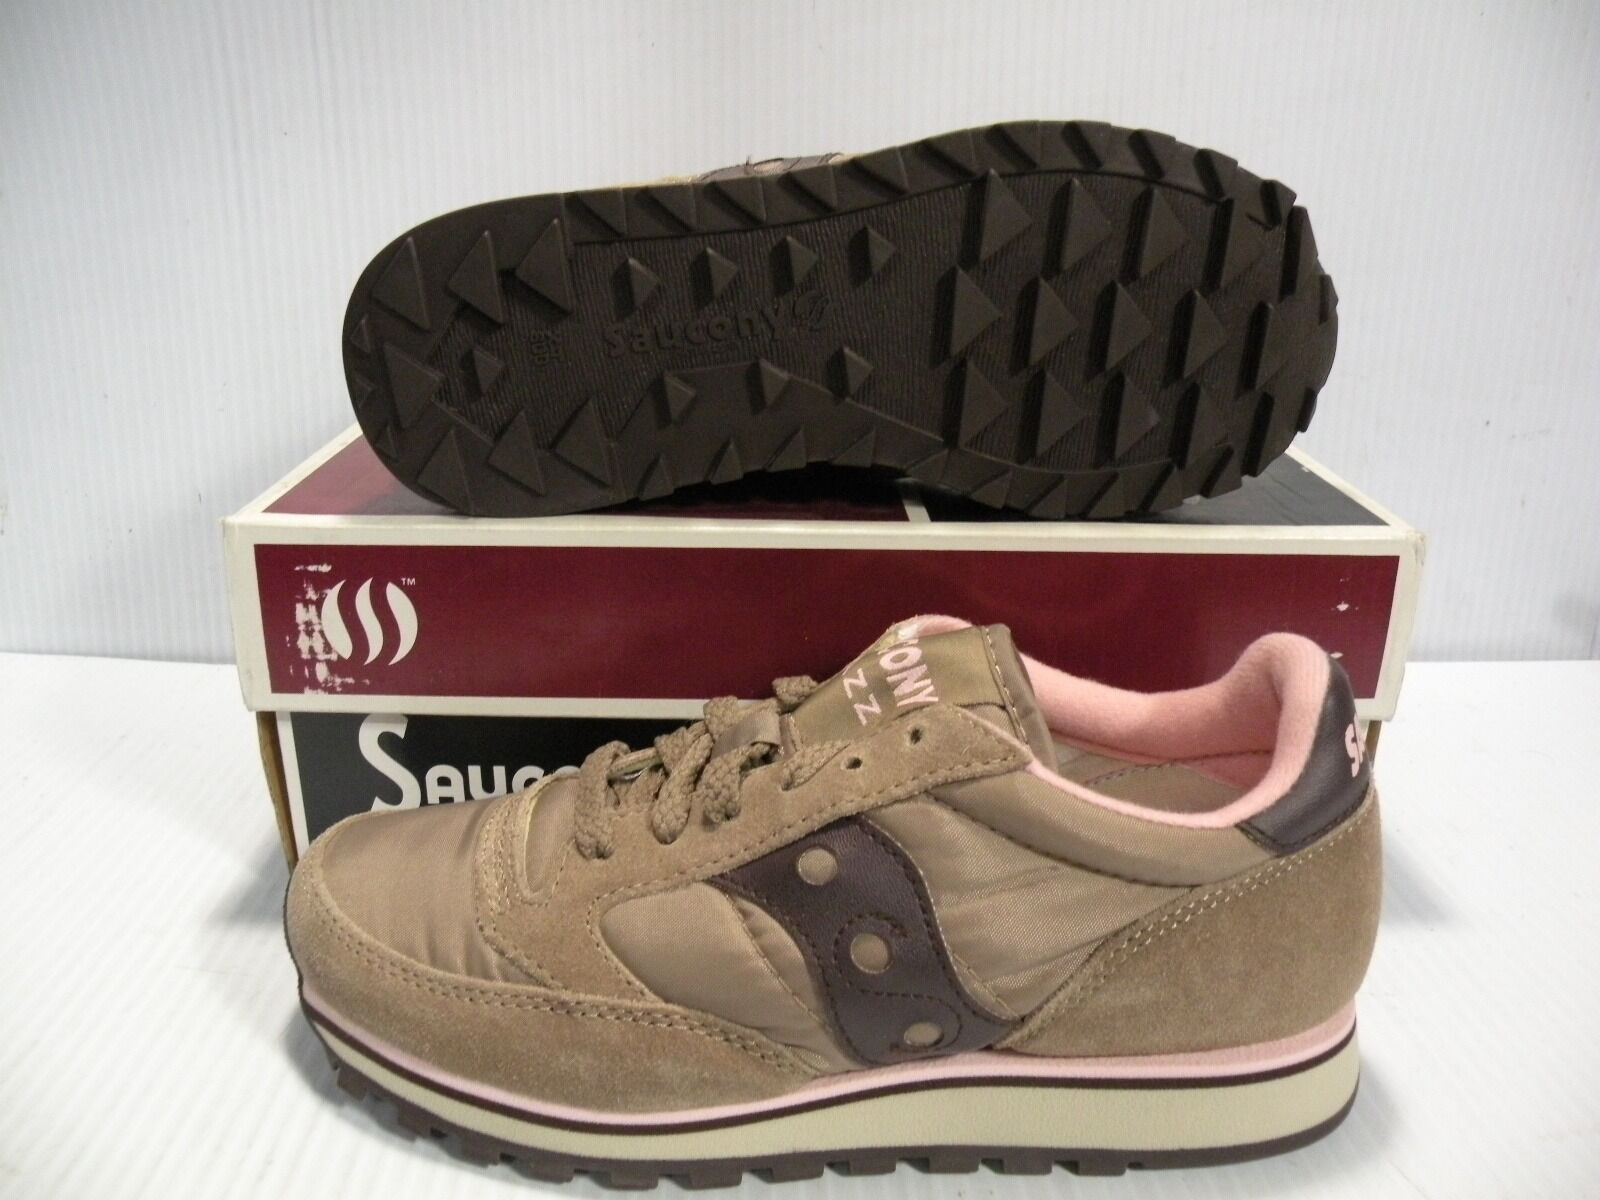 SAUCONY JAZZ SERIES LOW SNEAKER WOMEN Schuhe MILK CHOCOLATE 1785-6  SIZE 5.5 NEW